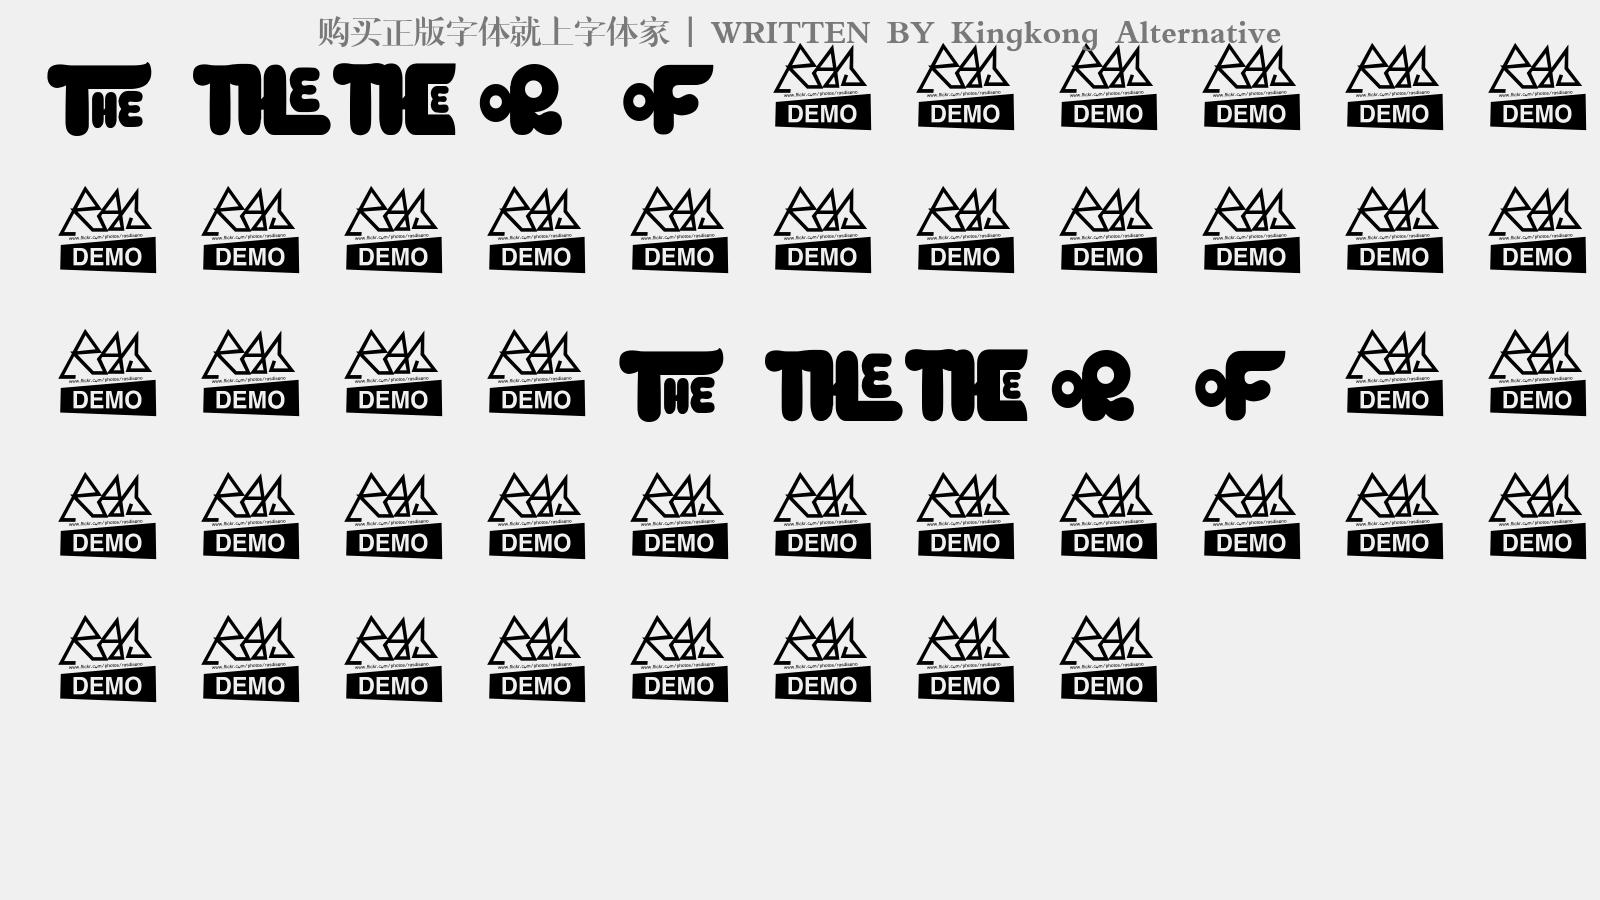 Kingkong Alternative - 大寫字母/小寫字母/數字